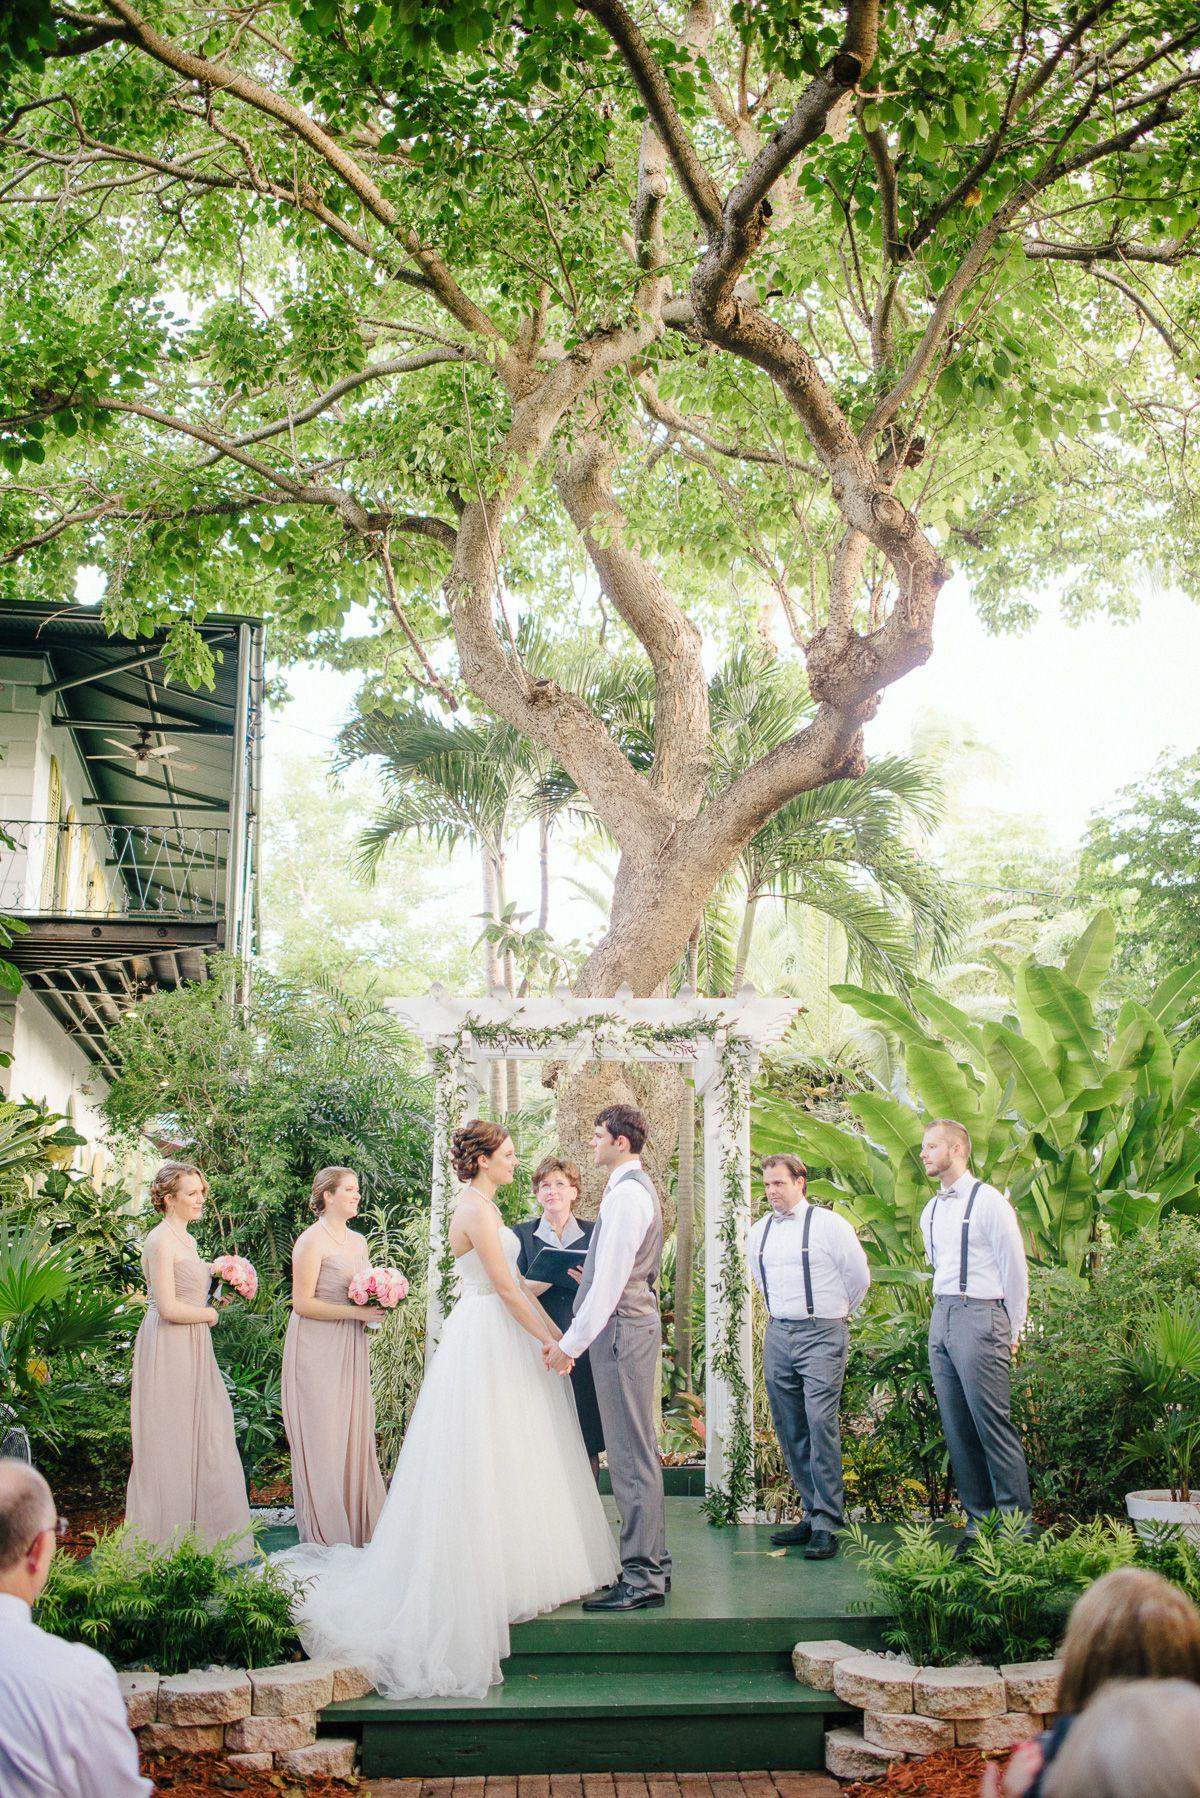 Small, Sweet Destination Wedding: Whitney & Aaron in Key ...